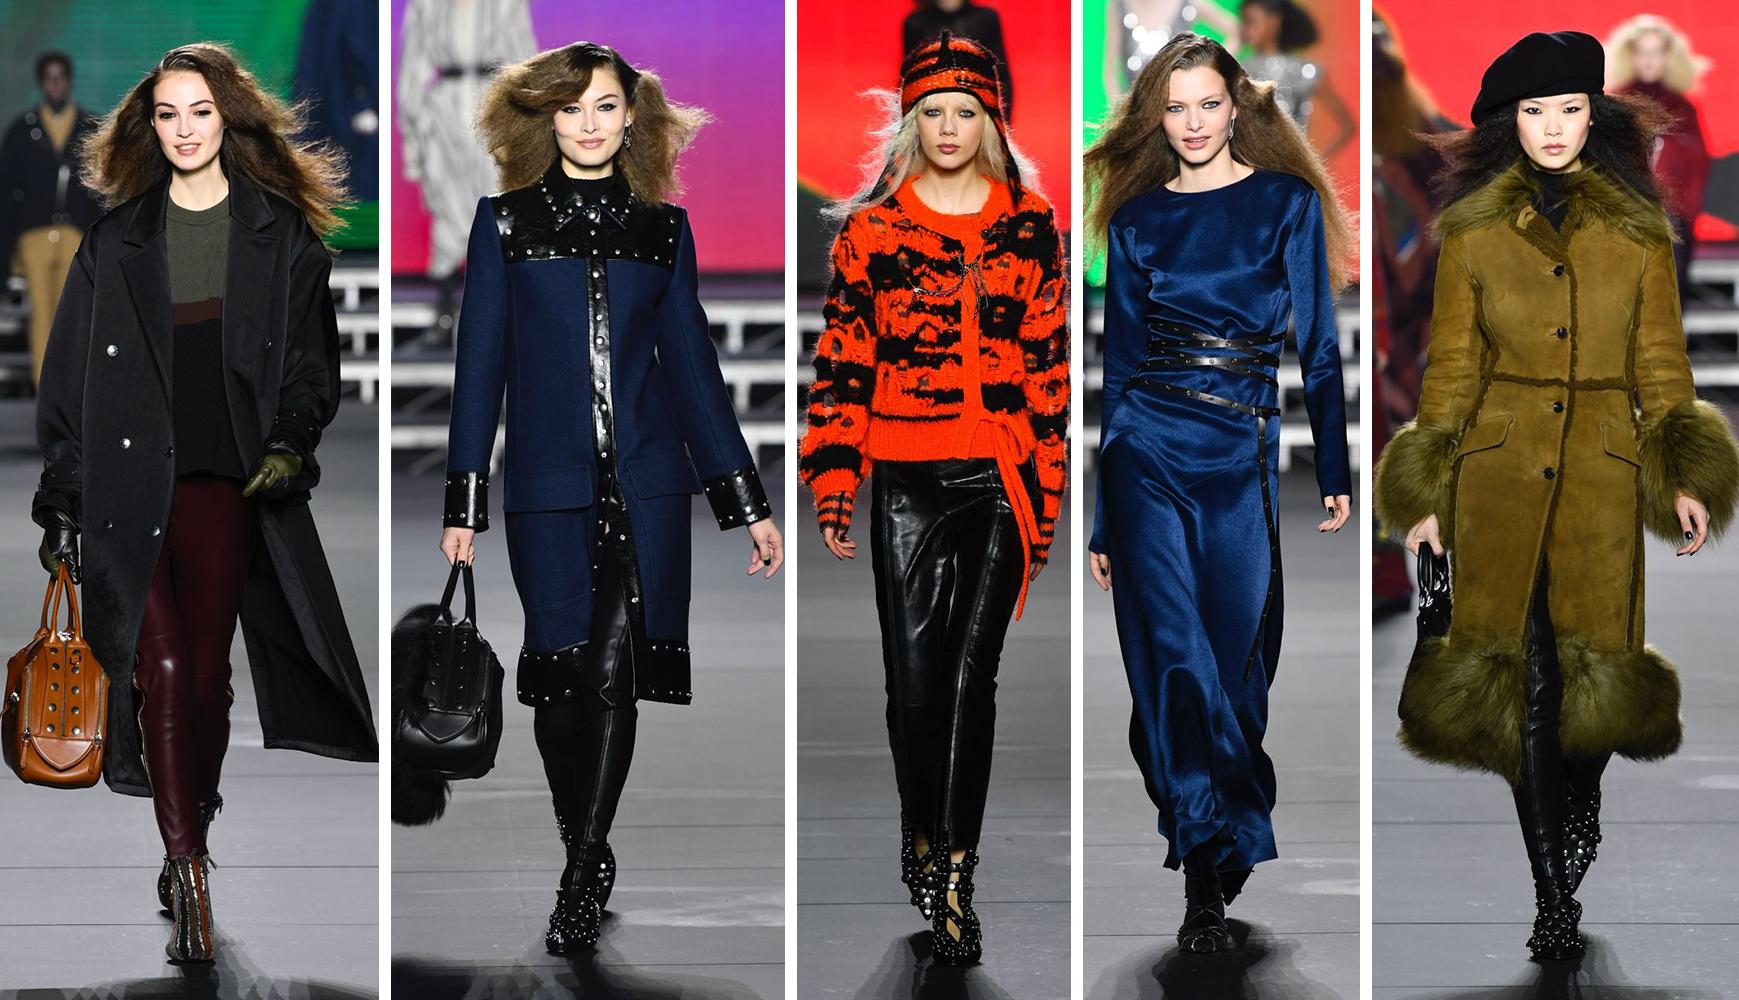 sonia_rykiel_parizsi_divathet_oszi-teli_ready-to-wear_kollekcio_2018.png